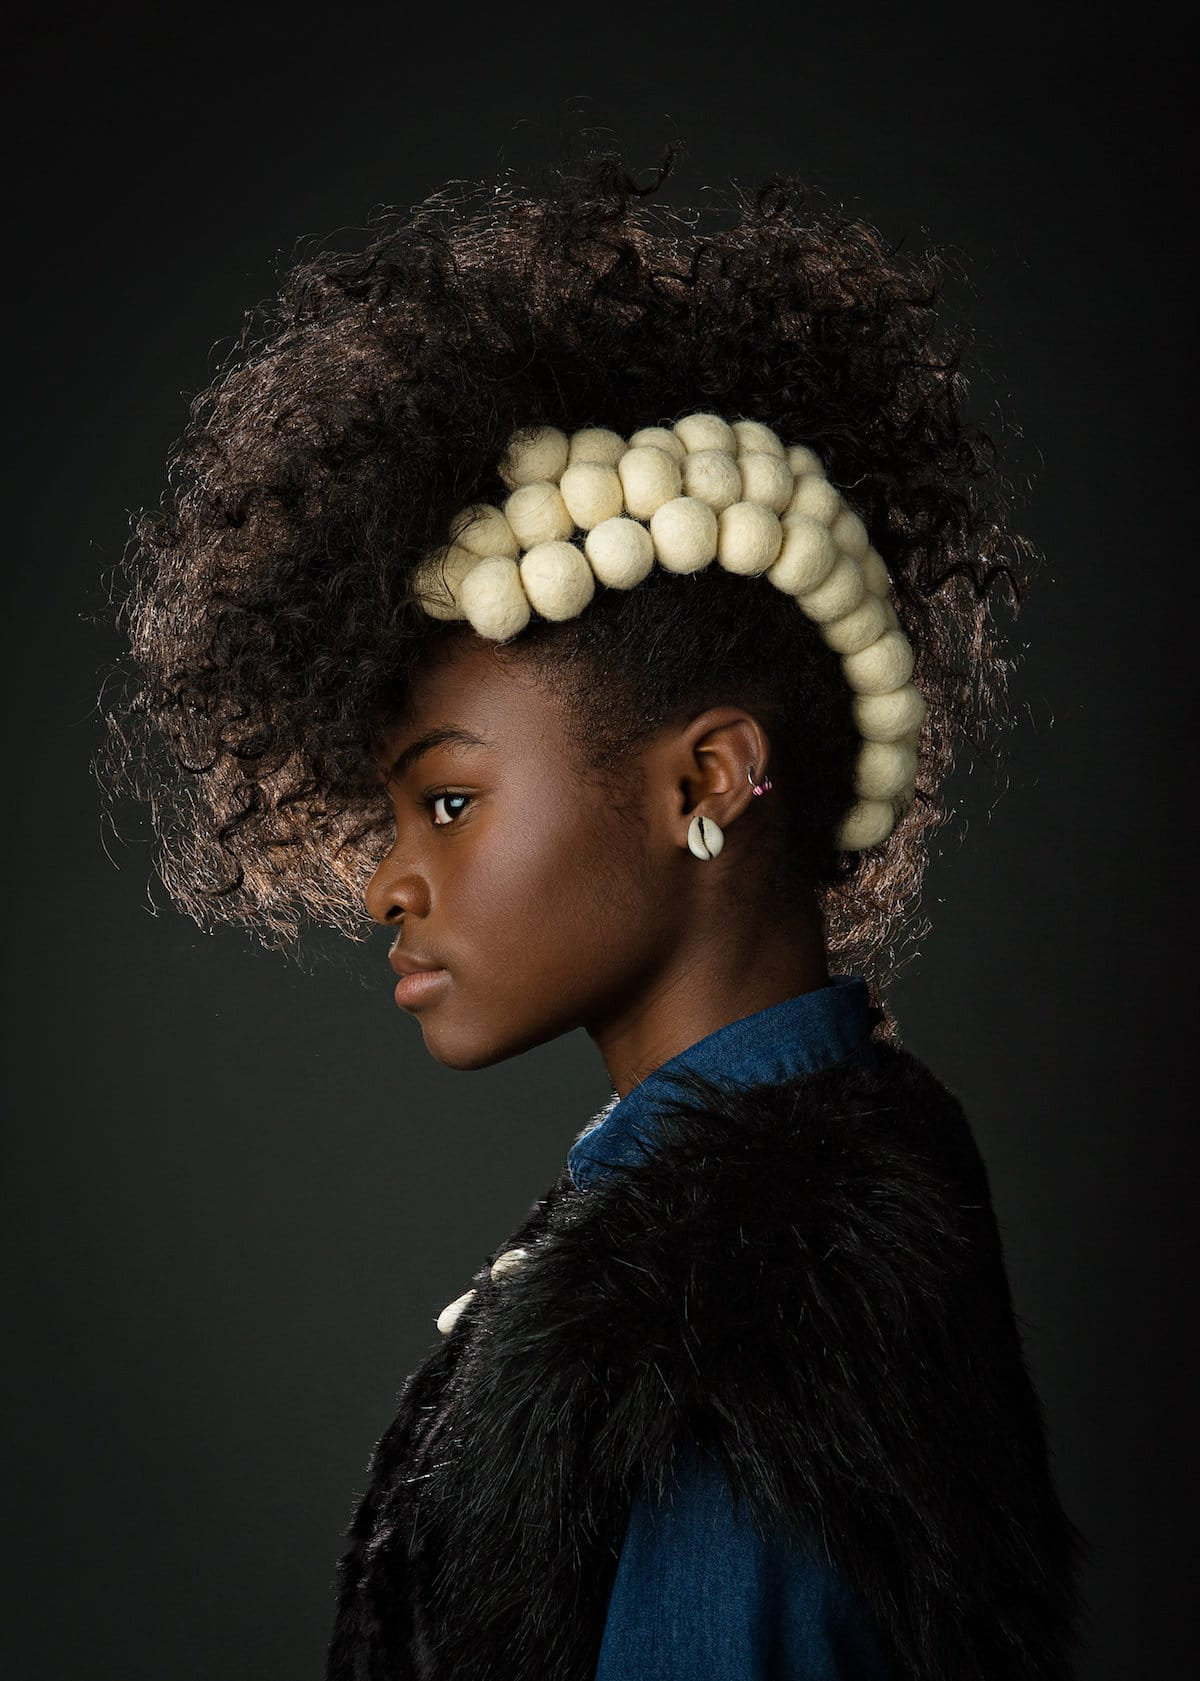 Afro-art-creative-soul-photography-3.jpg